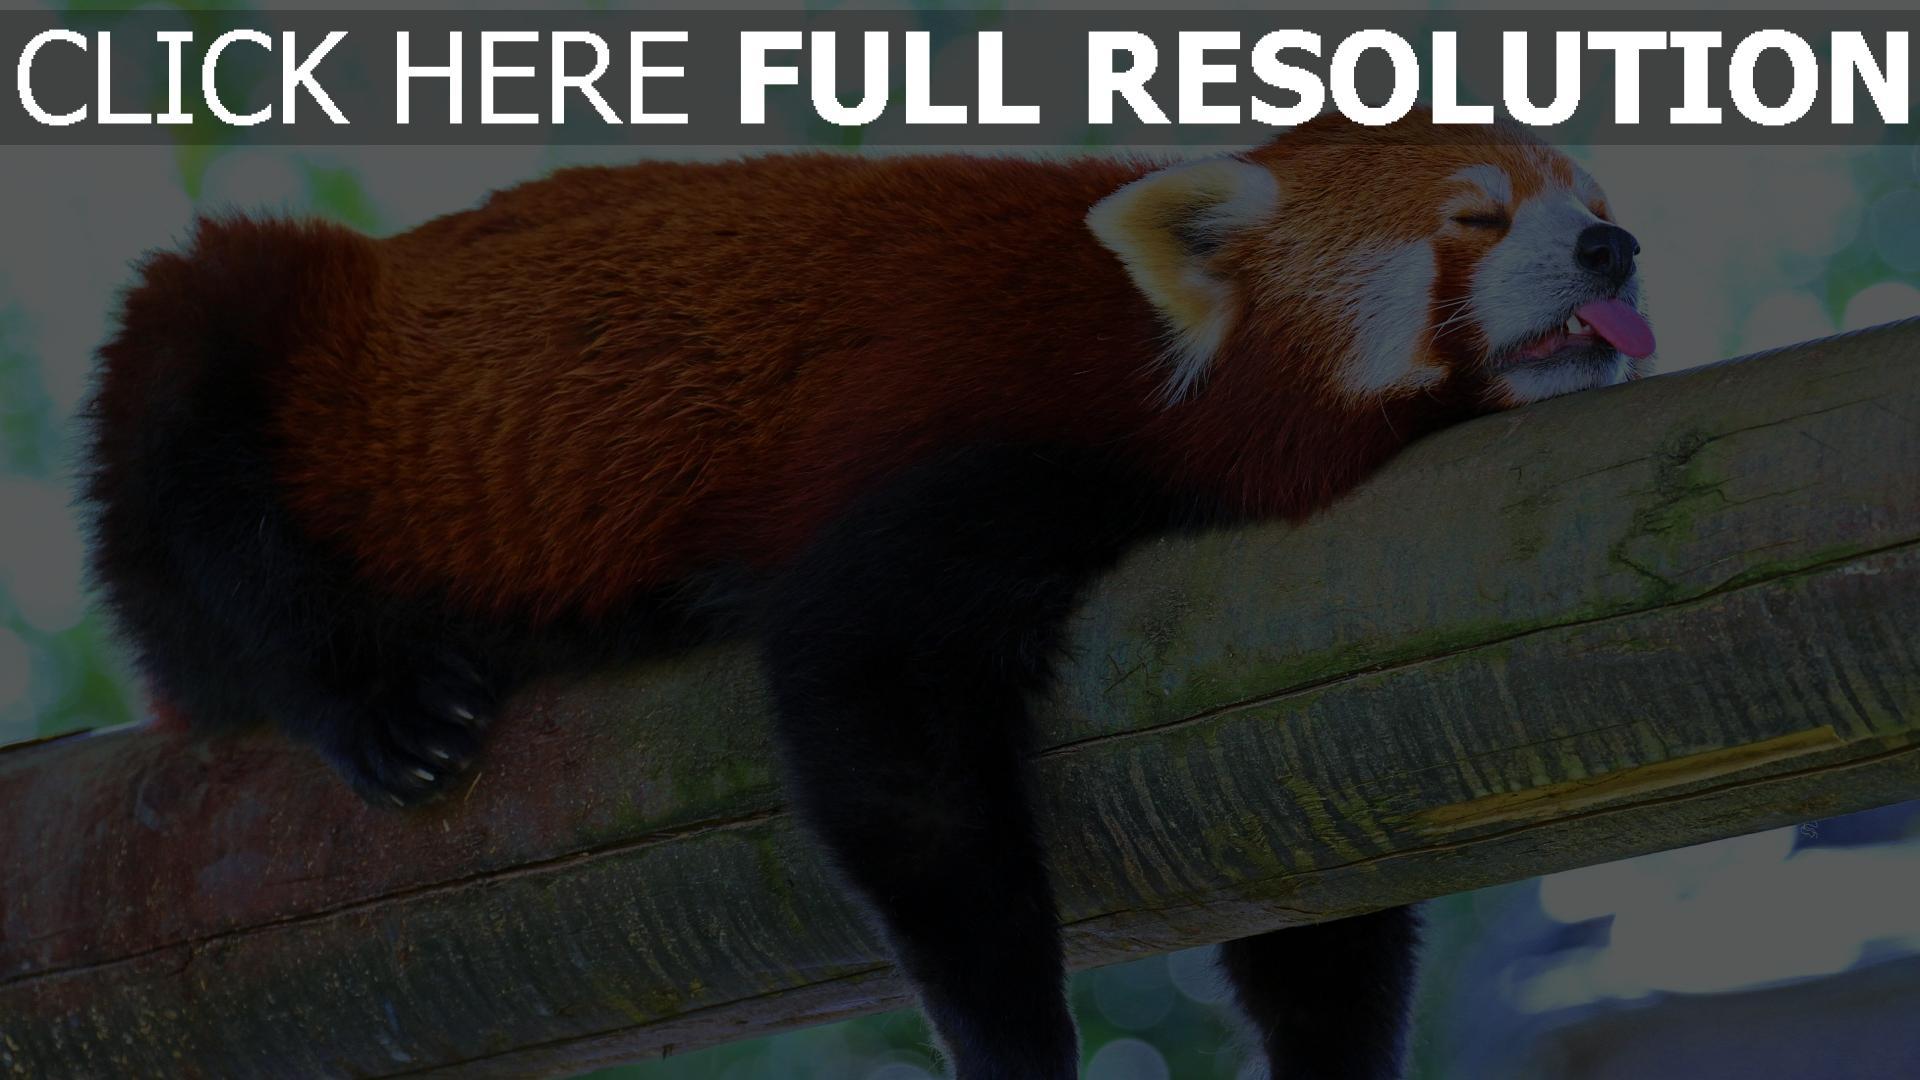 fond d'écran 1920x1080 panda rouge langue branche dormir